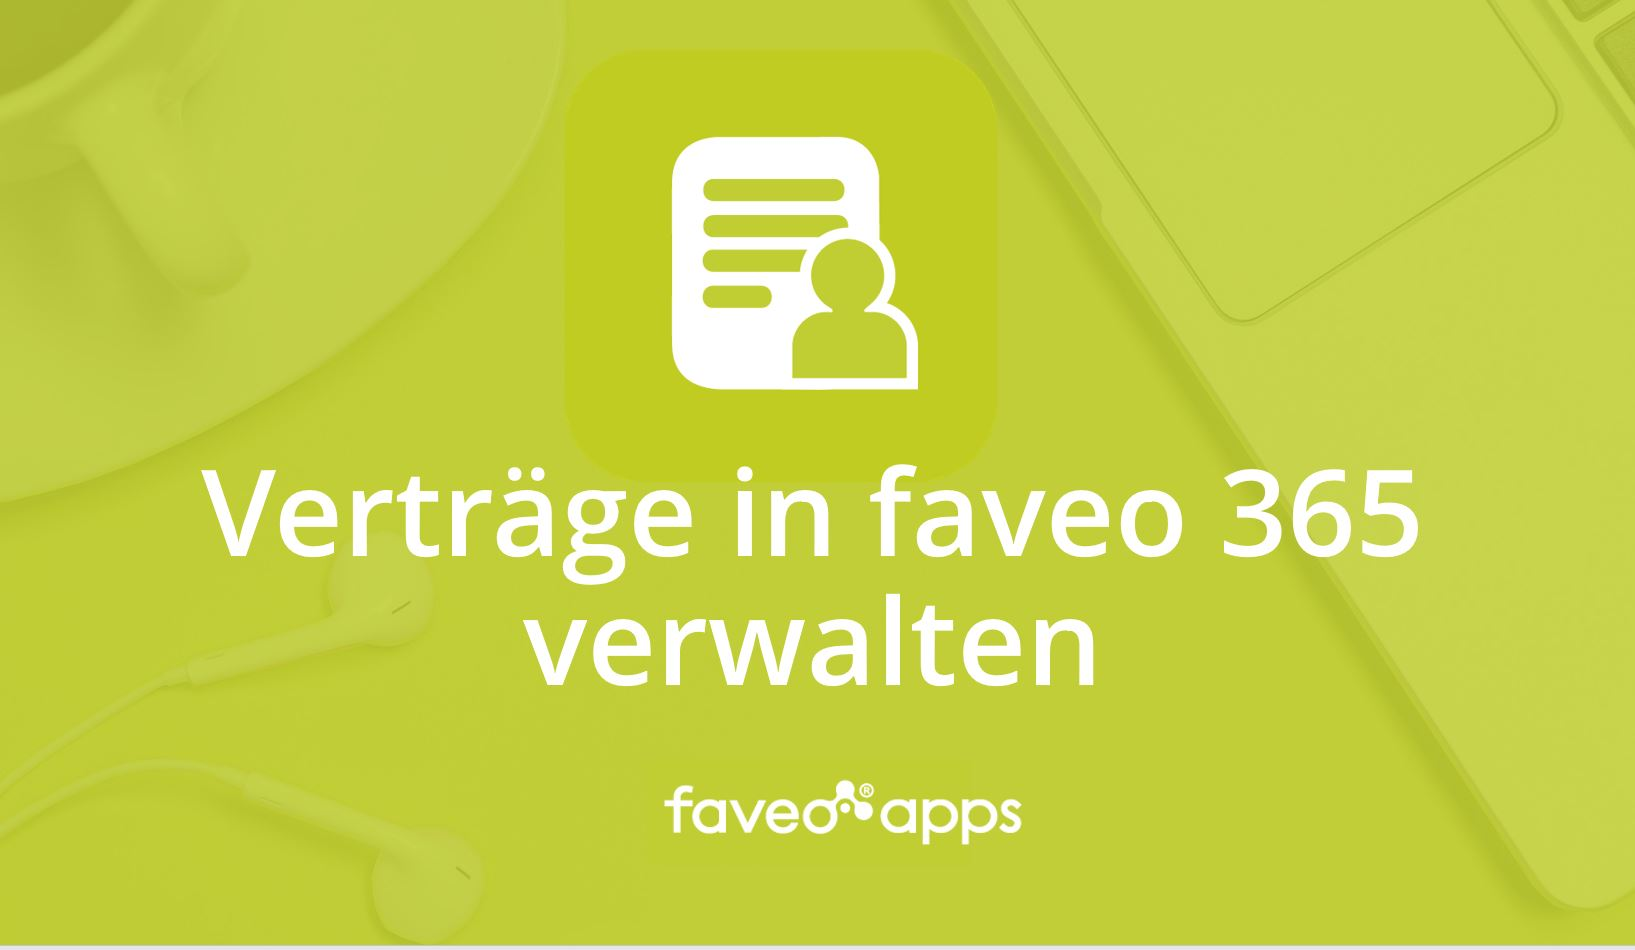 www.faveo.comwp-contentuploads201902Vertragsmanager-2